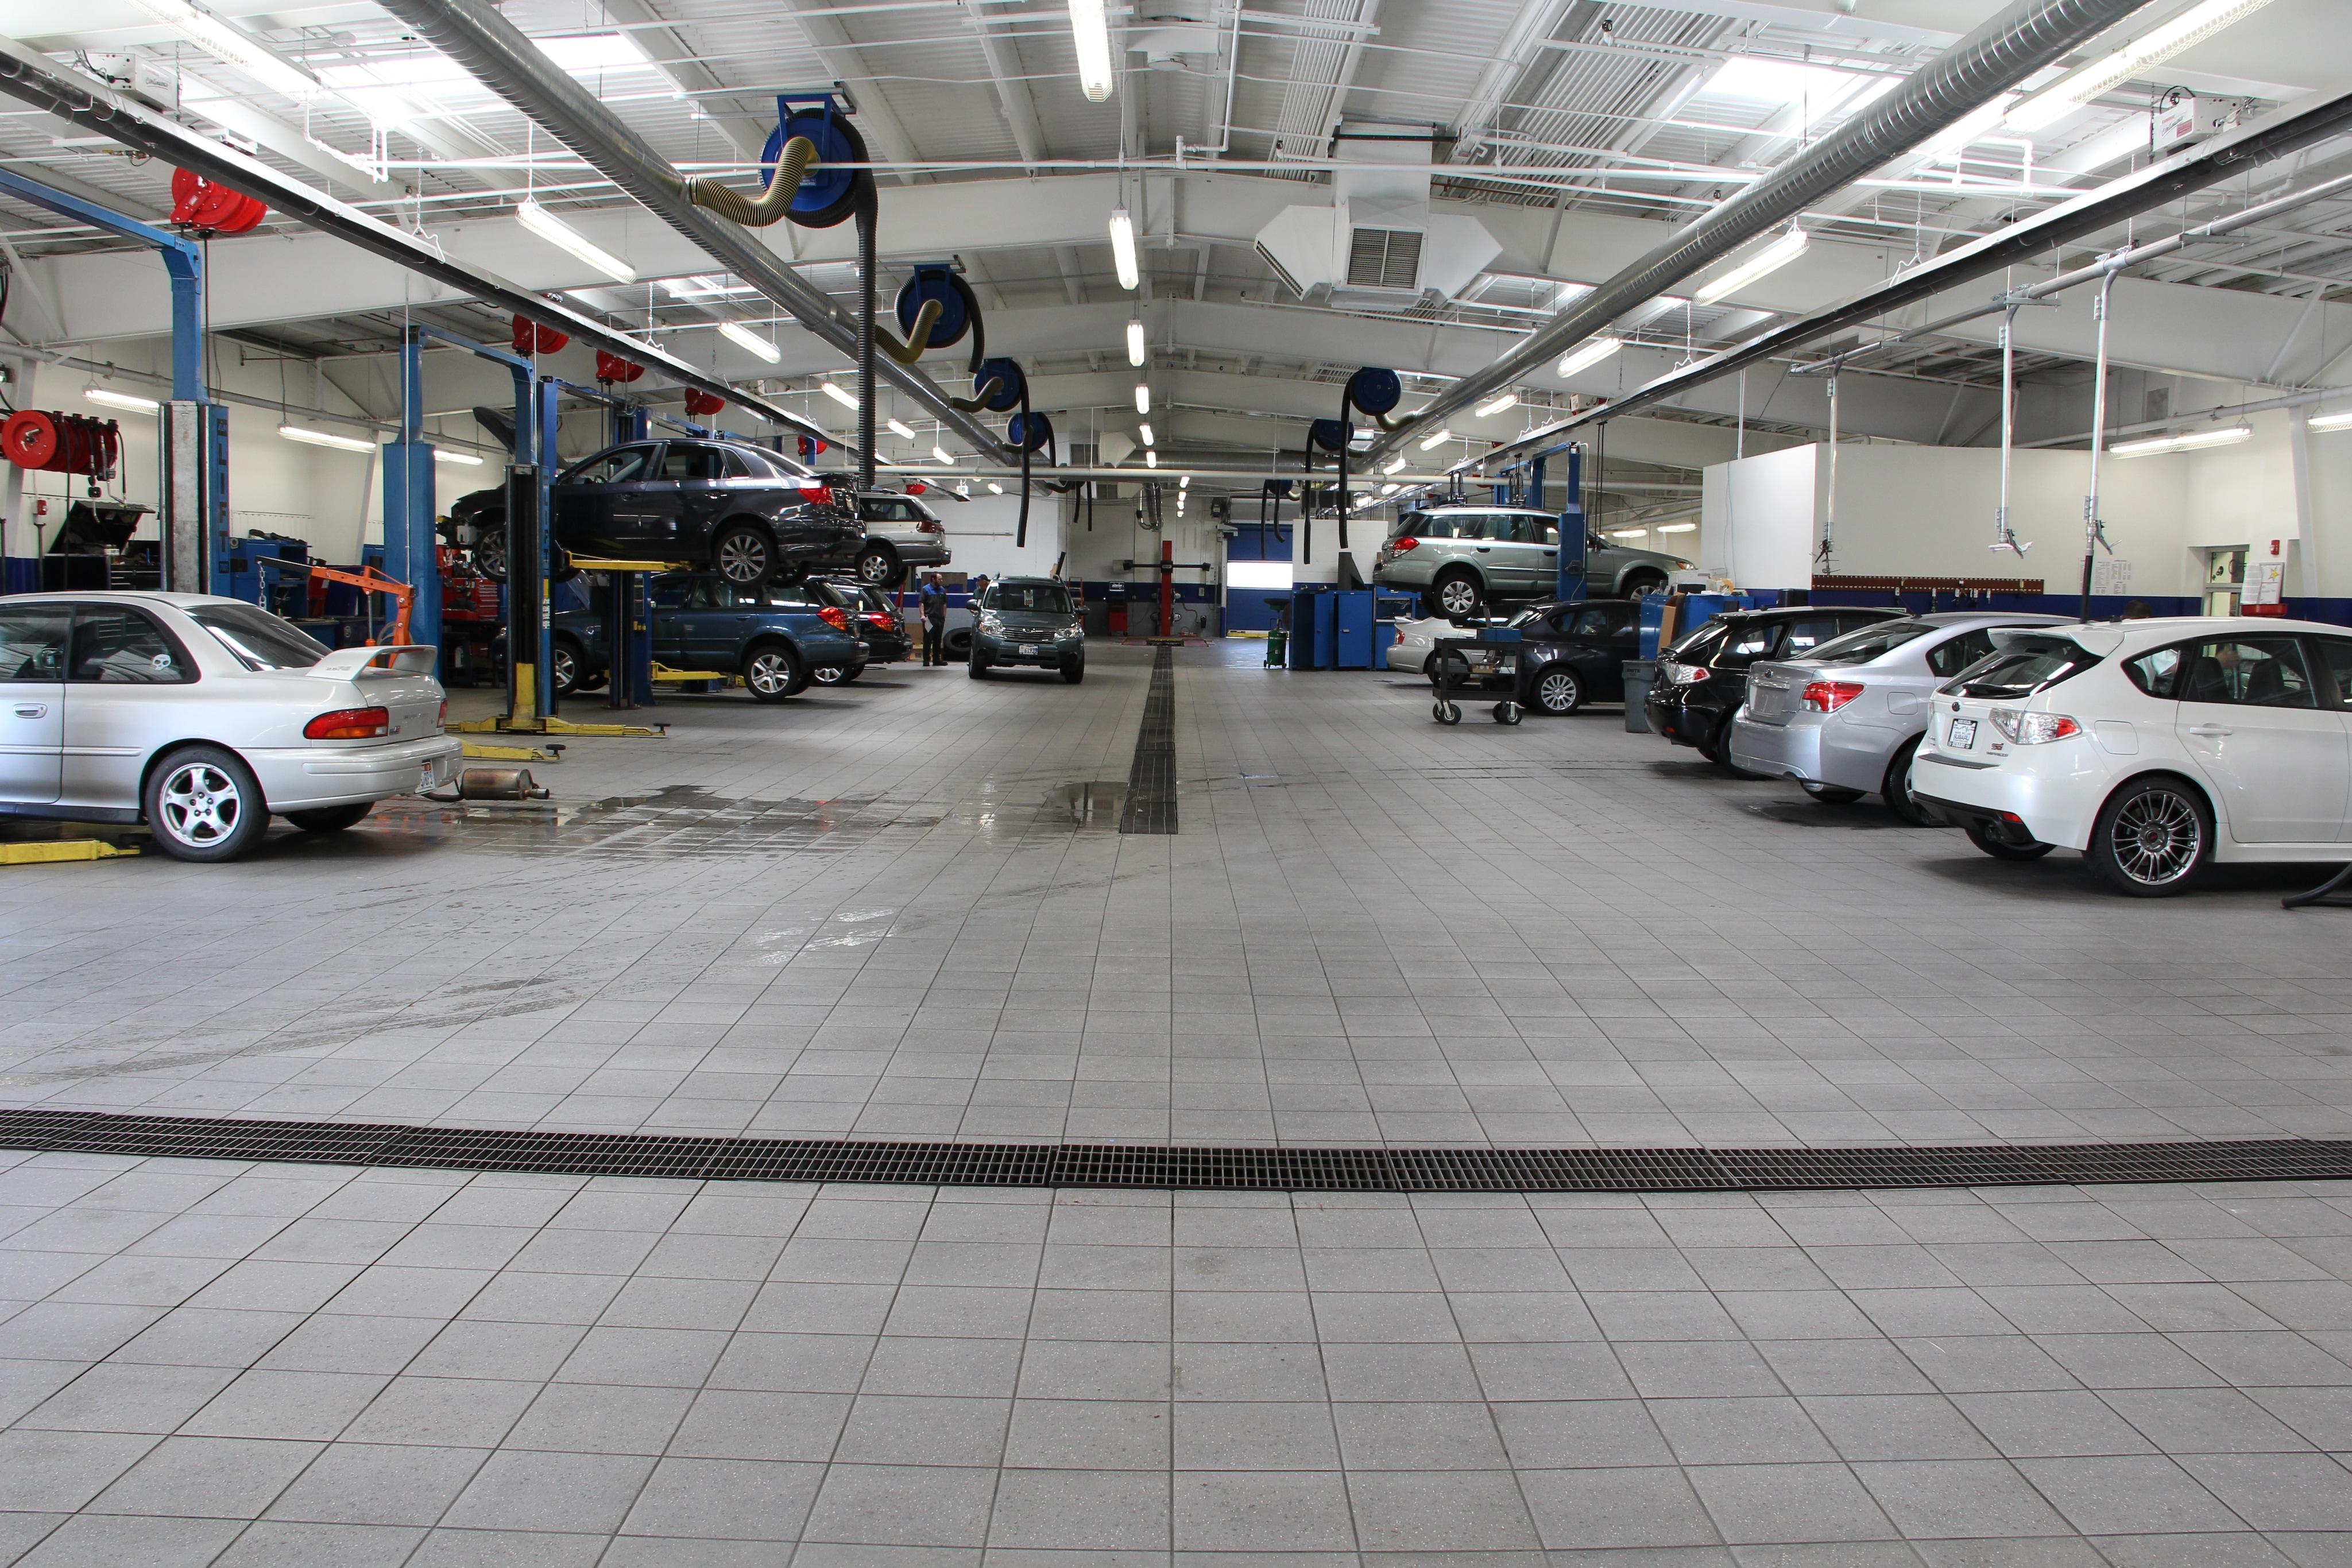 salt lake city subaru auto service center subaru maintenance car repair. Black Bedroom Furniture Sets. Home Design Ideas